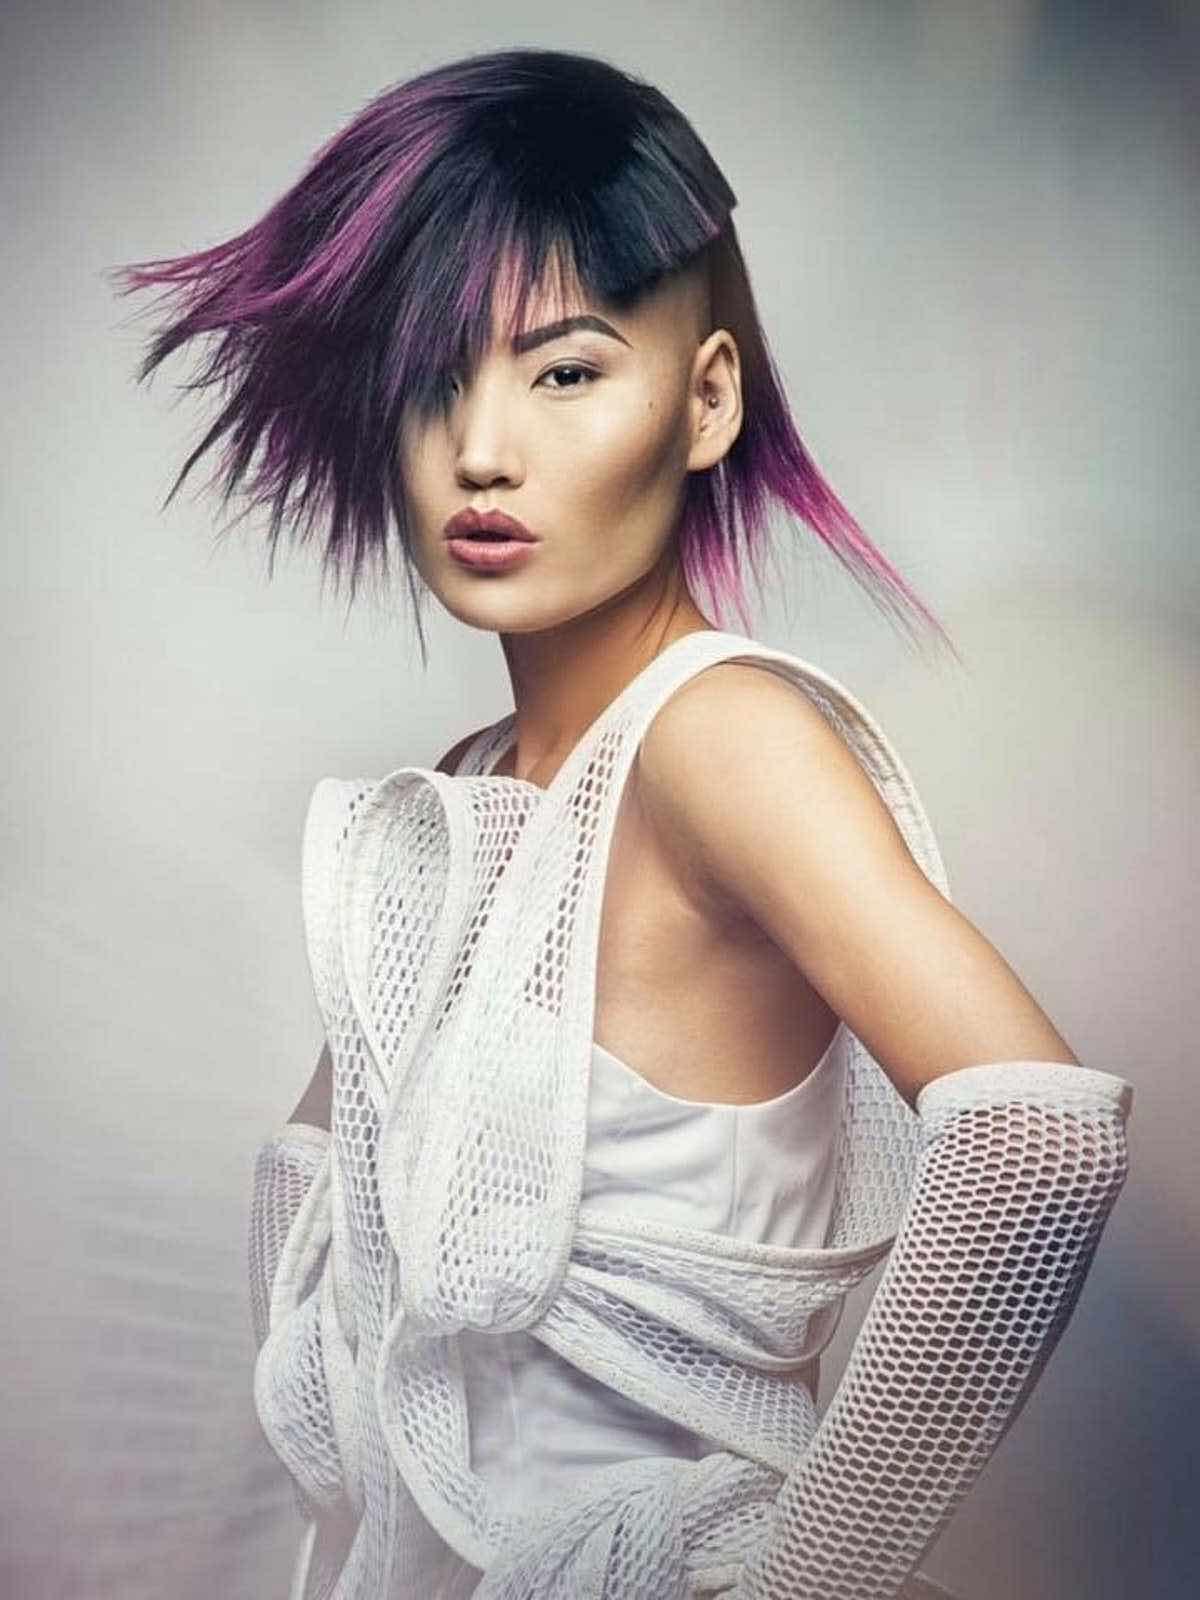 sce-agency-female-model-tia-b-3aaa